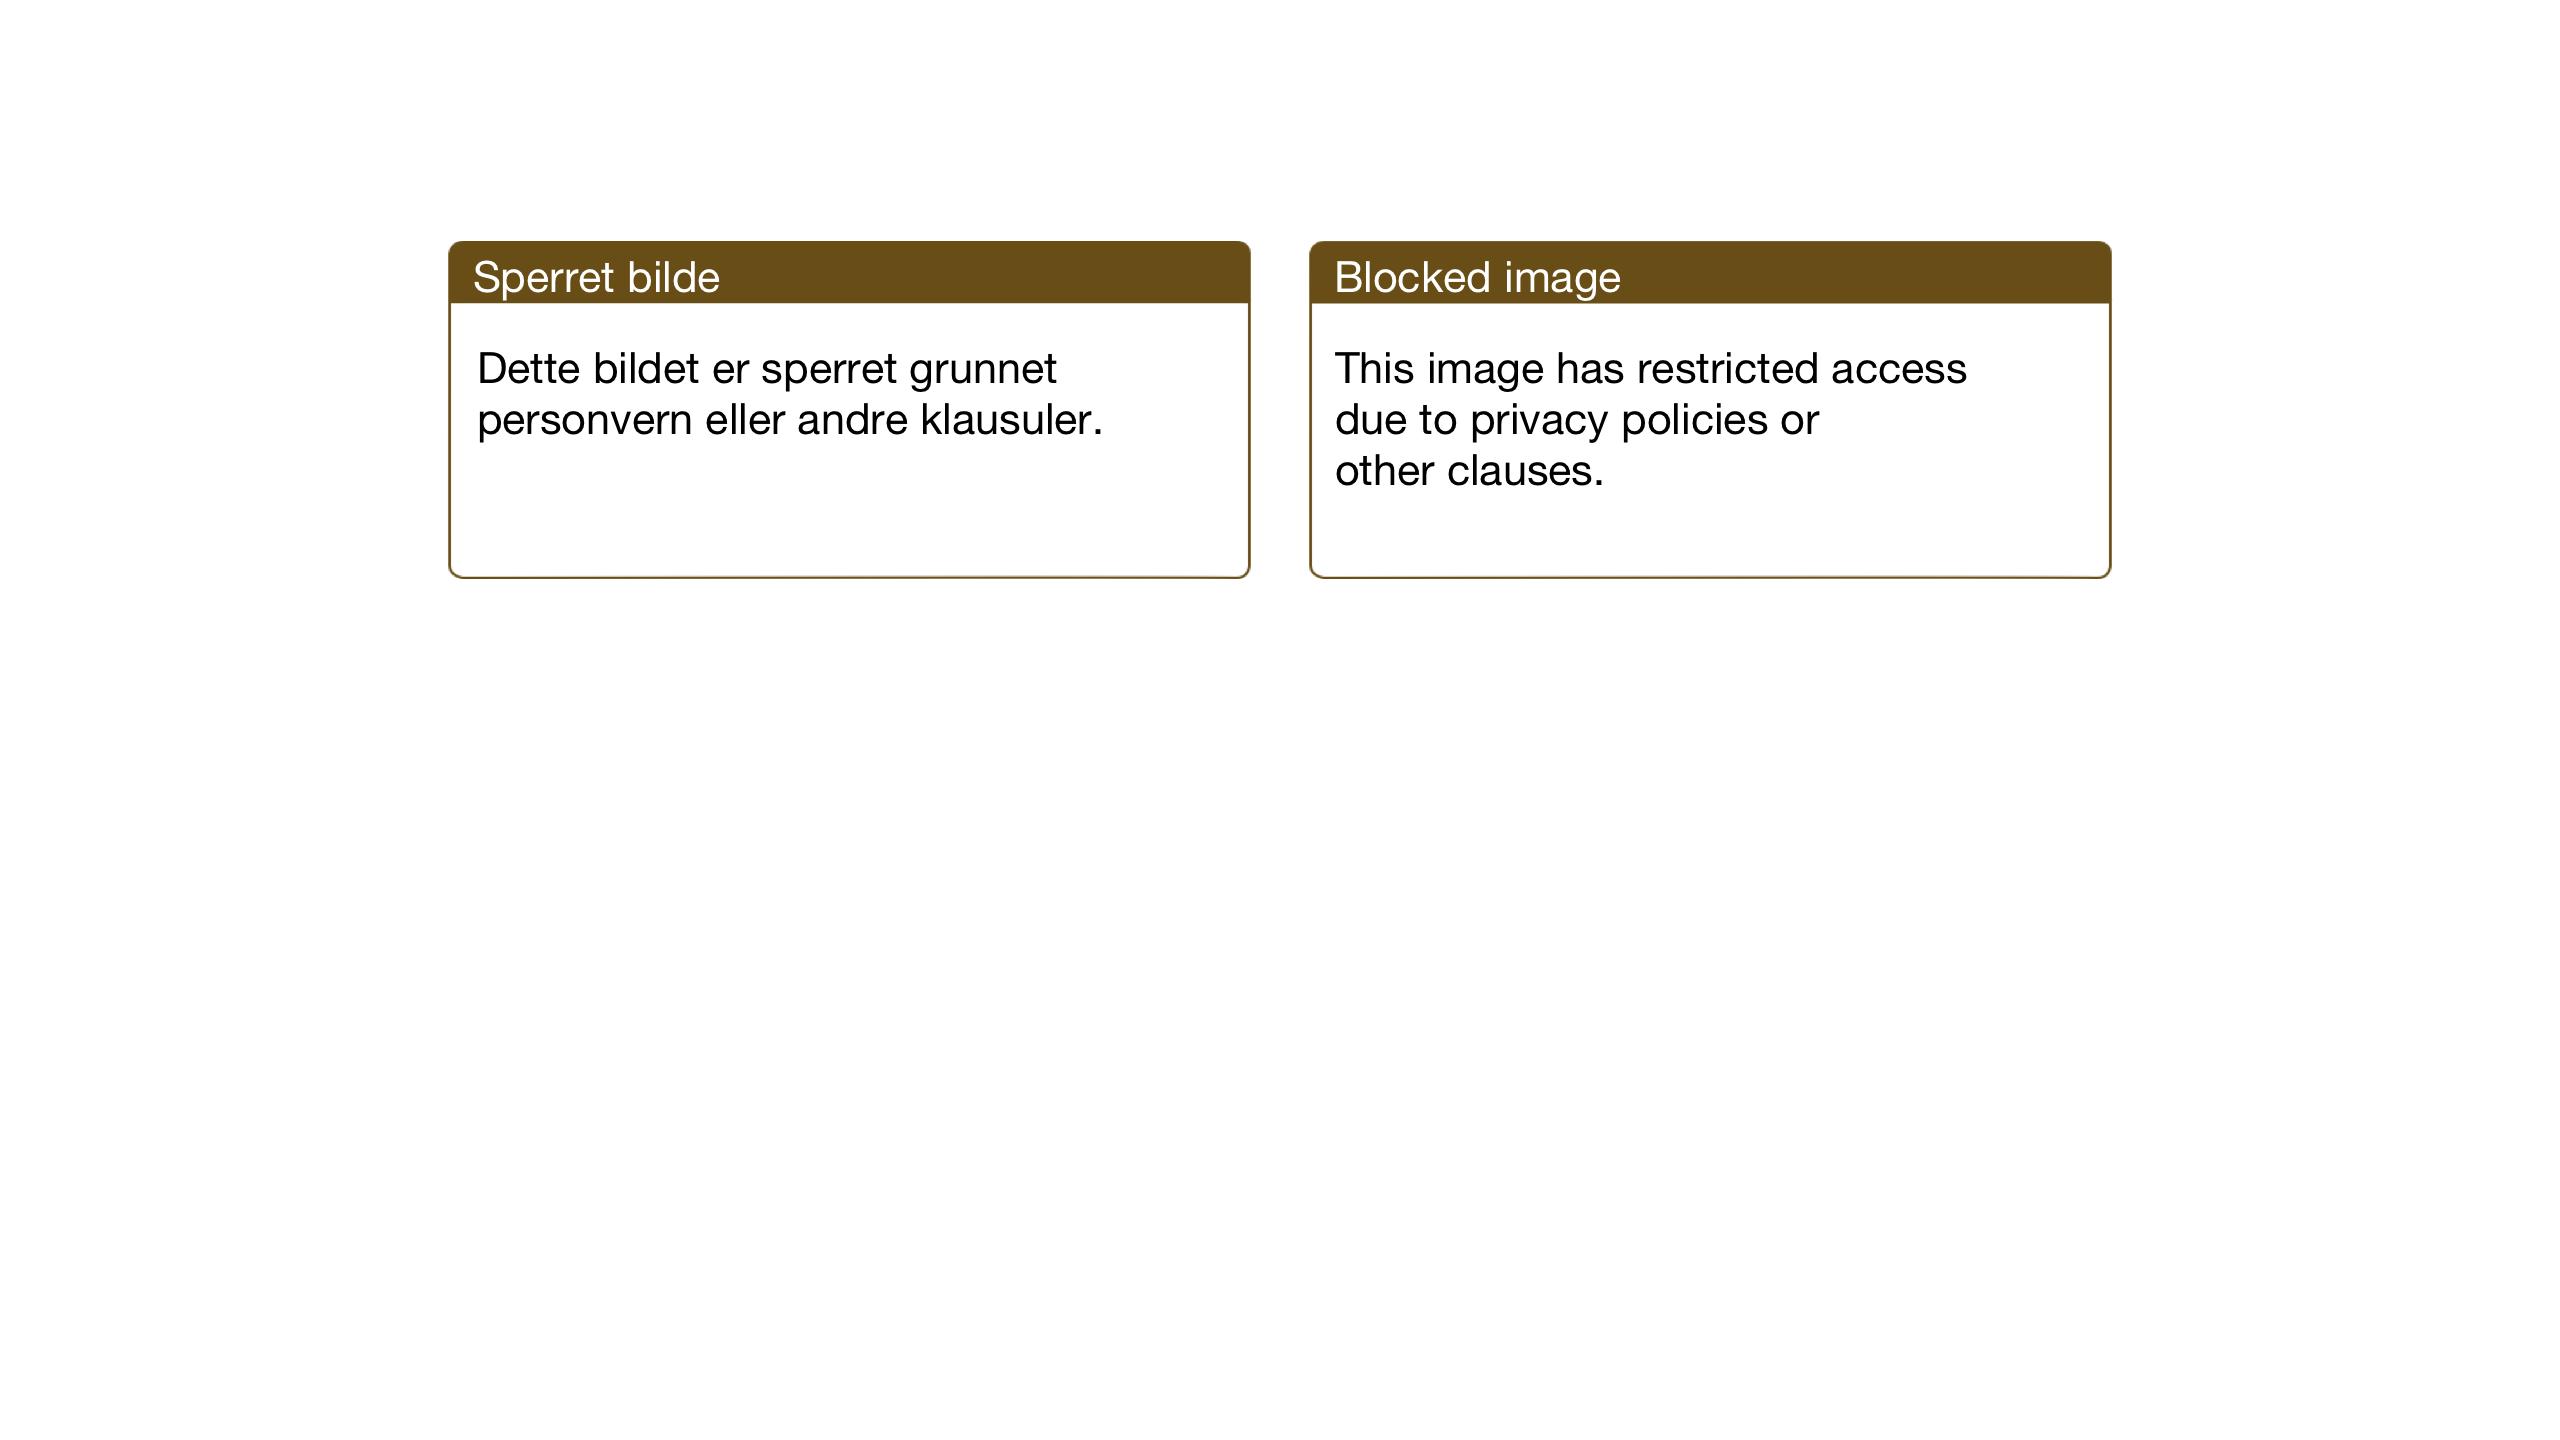 SAT, Ministerialprotokoller, klokkerbøker og fødselsregistre - Nordland, 847/L0680: Klokkerbok nr. 847C08, 1930-1947, s. 79